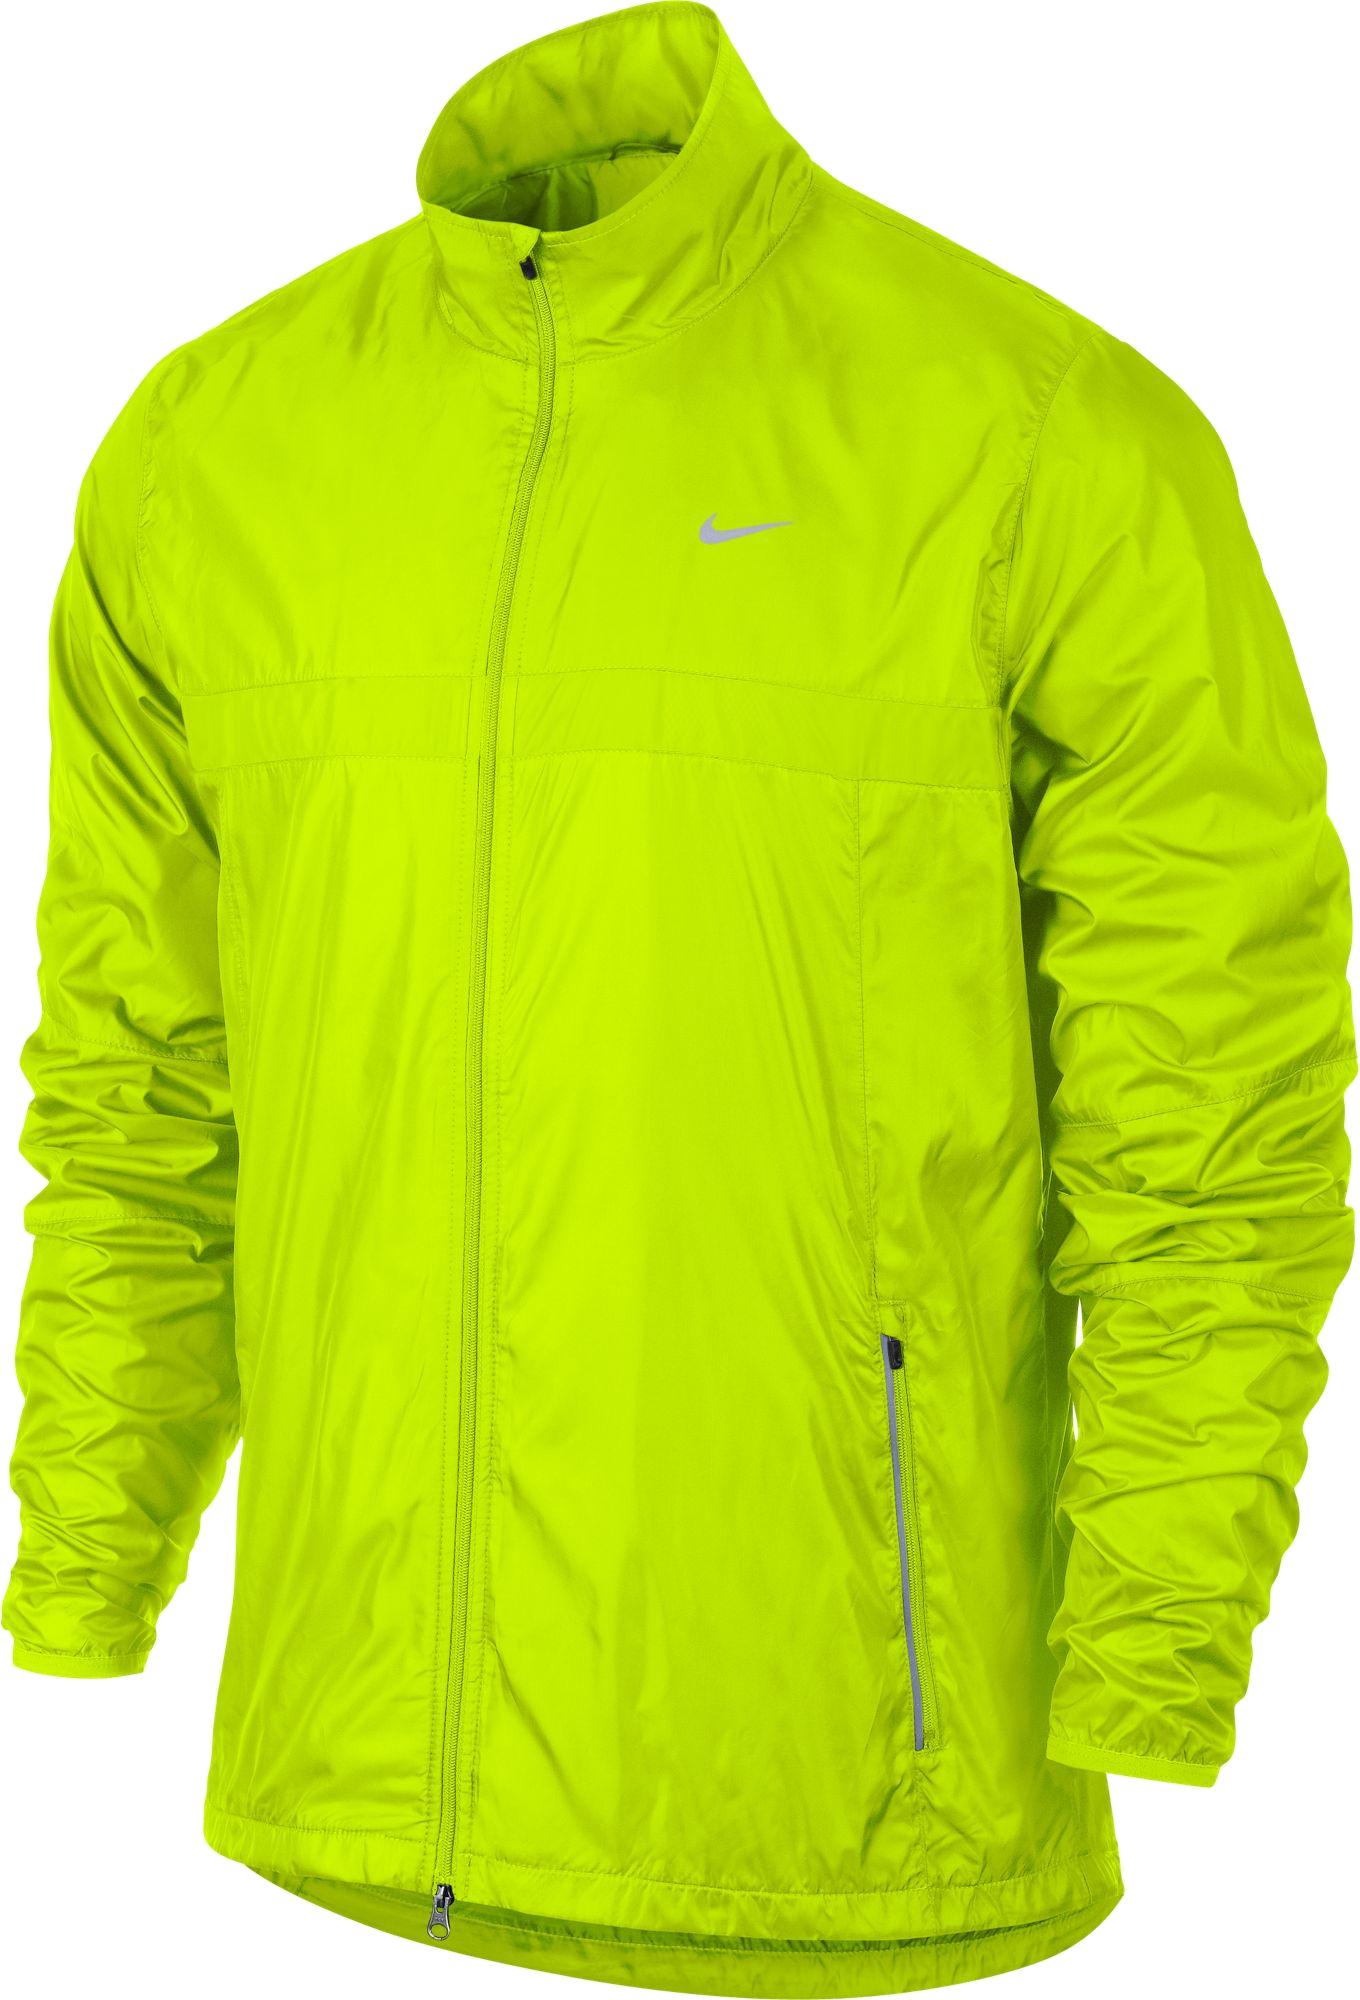 Зеленая куртка PNG фото